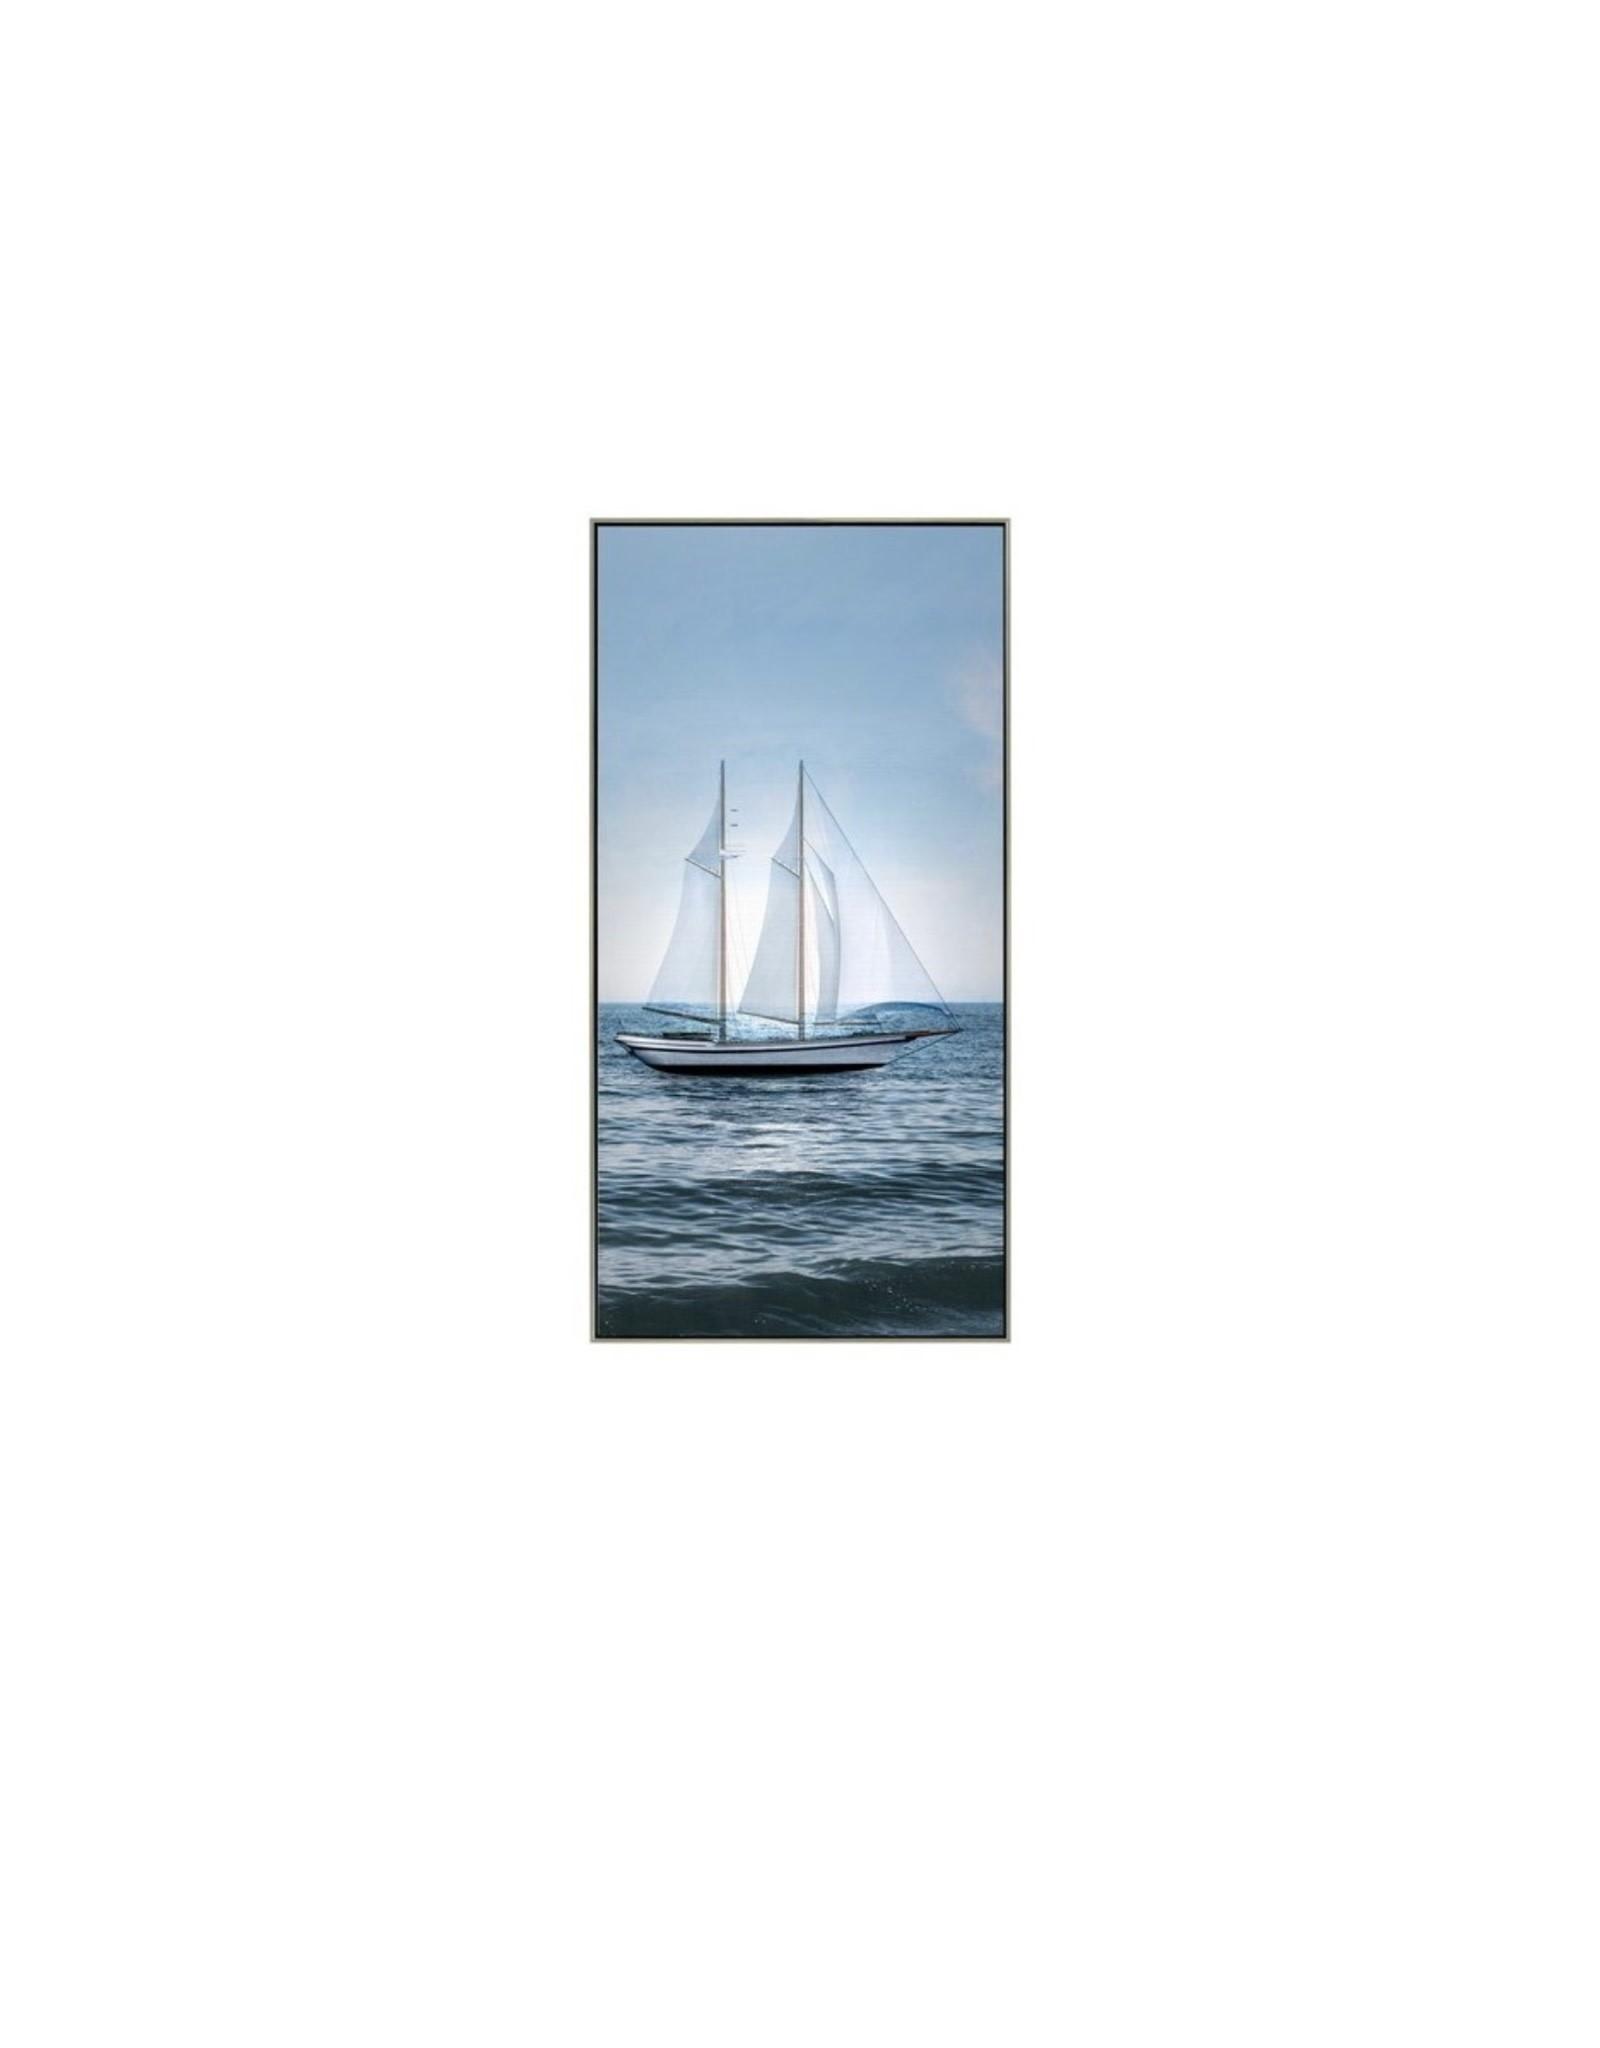 Art Oil CJ Sailboat At Sea Framed 3838JM320700